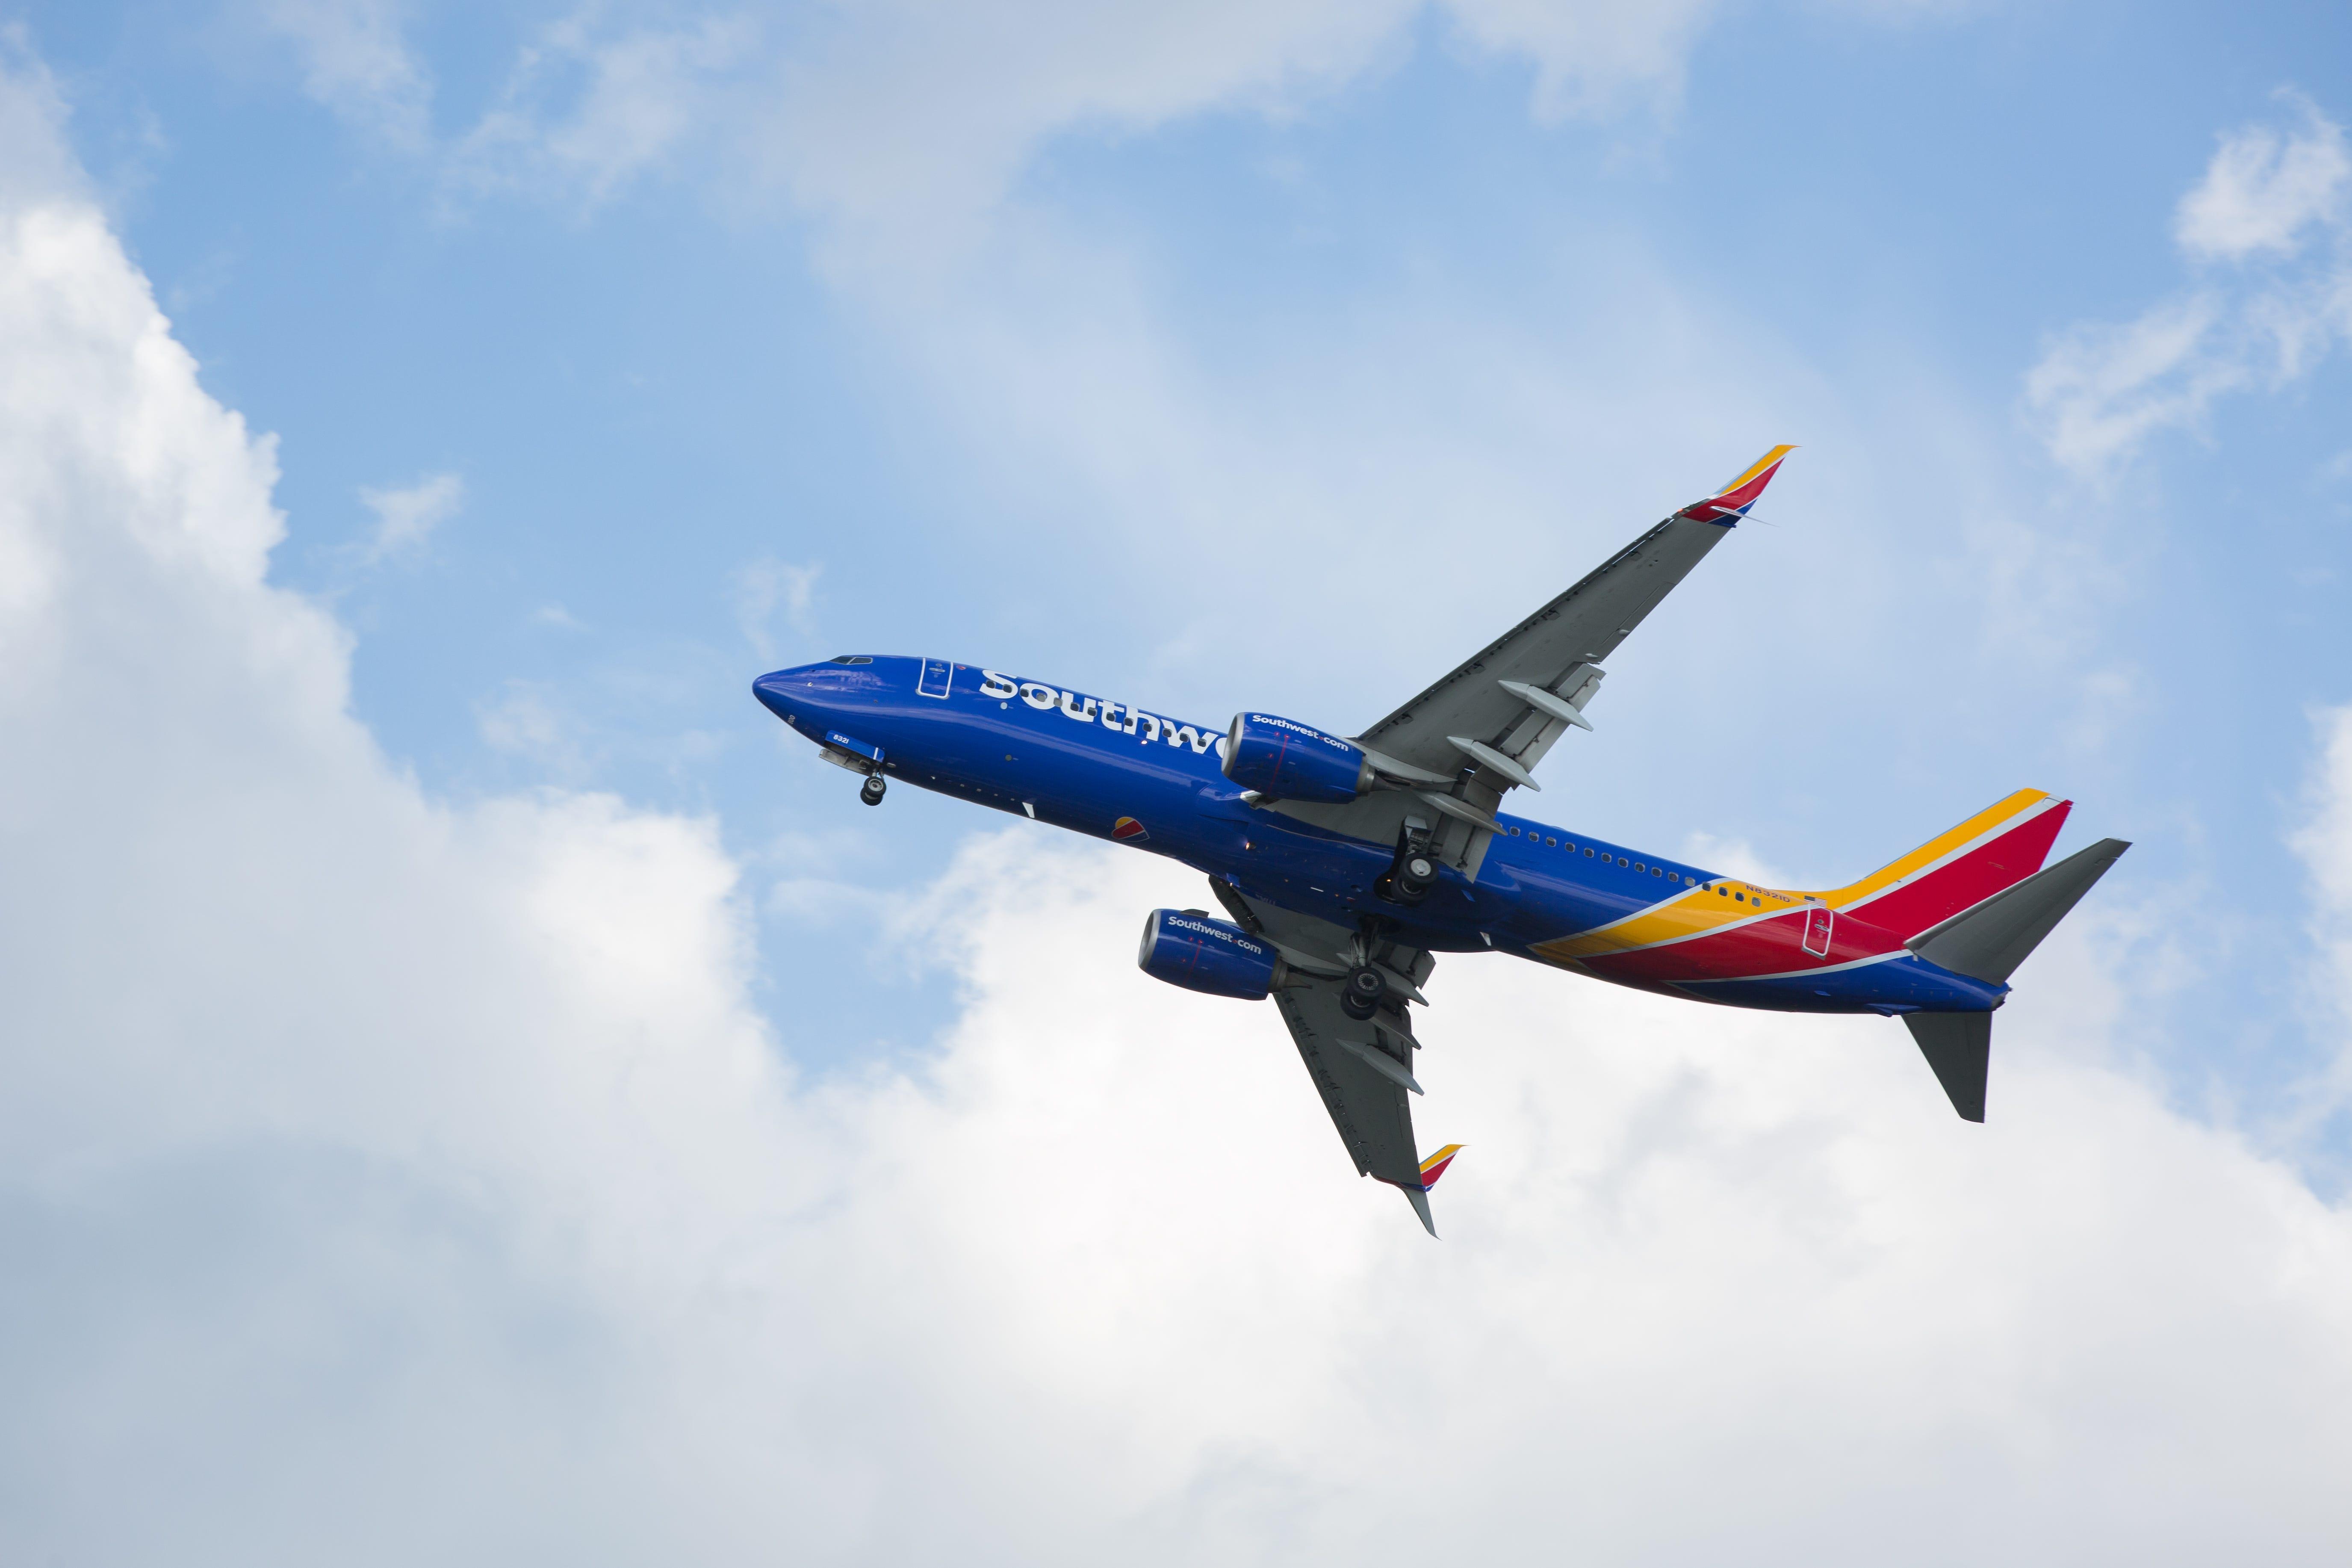 Southwest pilot gets a memorable sendoff as he retires: Aerial shots of his final takeoff